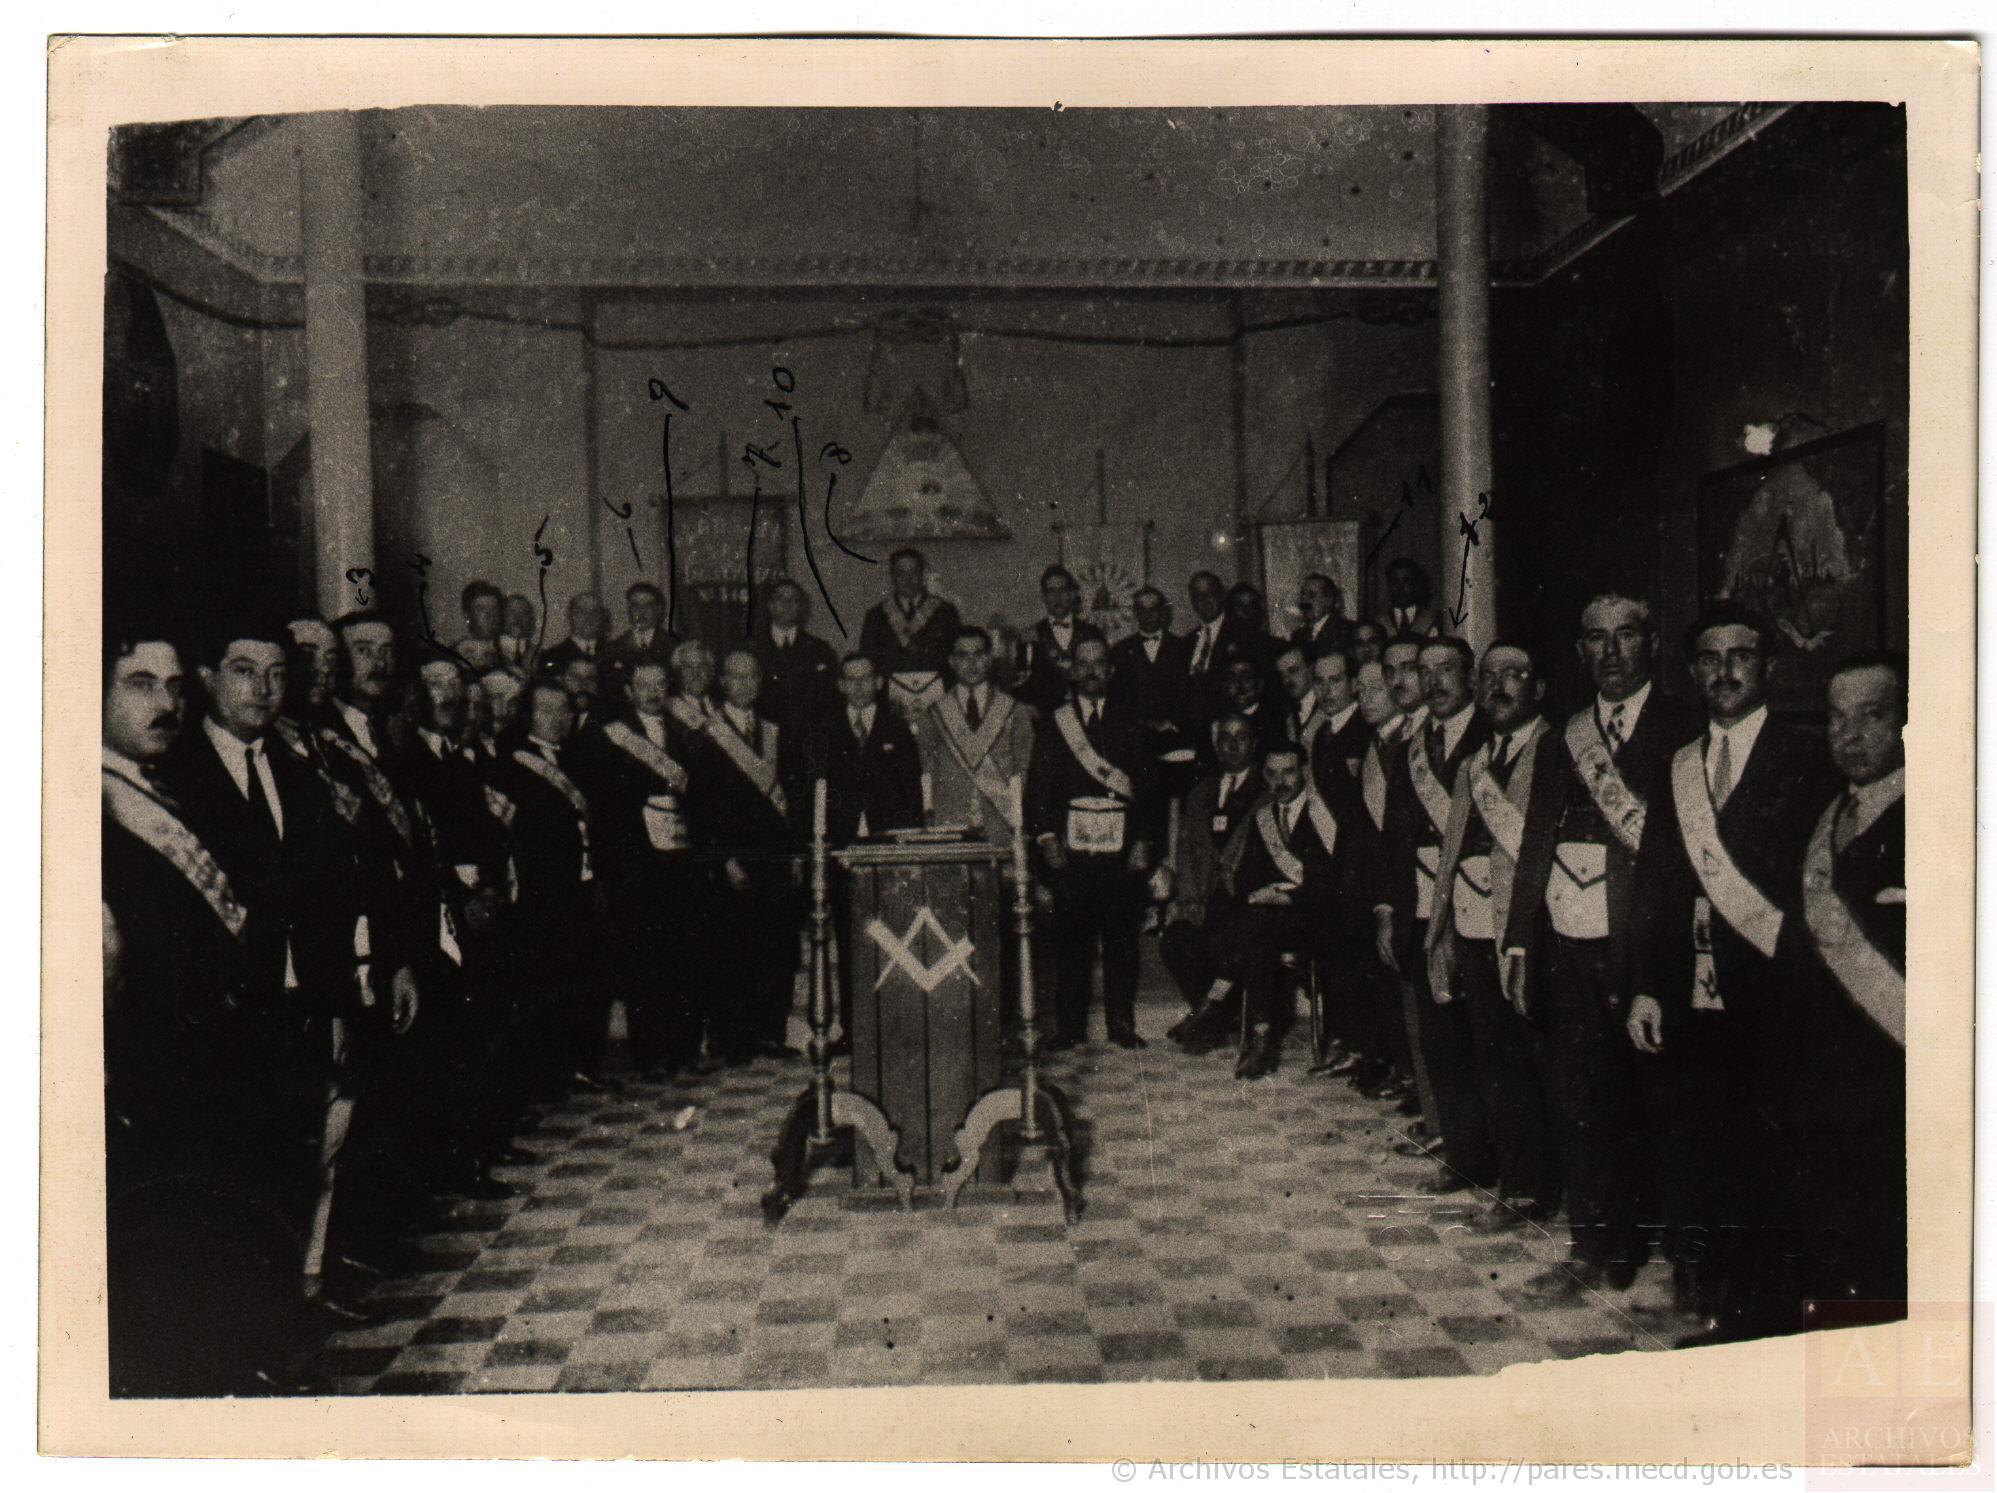 Tenida fúnebre en recuerdo de Carmen de Burgos (Centro Documental de la Memoria Histórica, 1932)